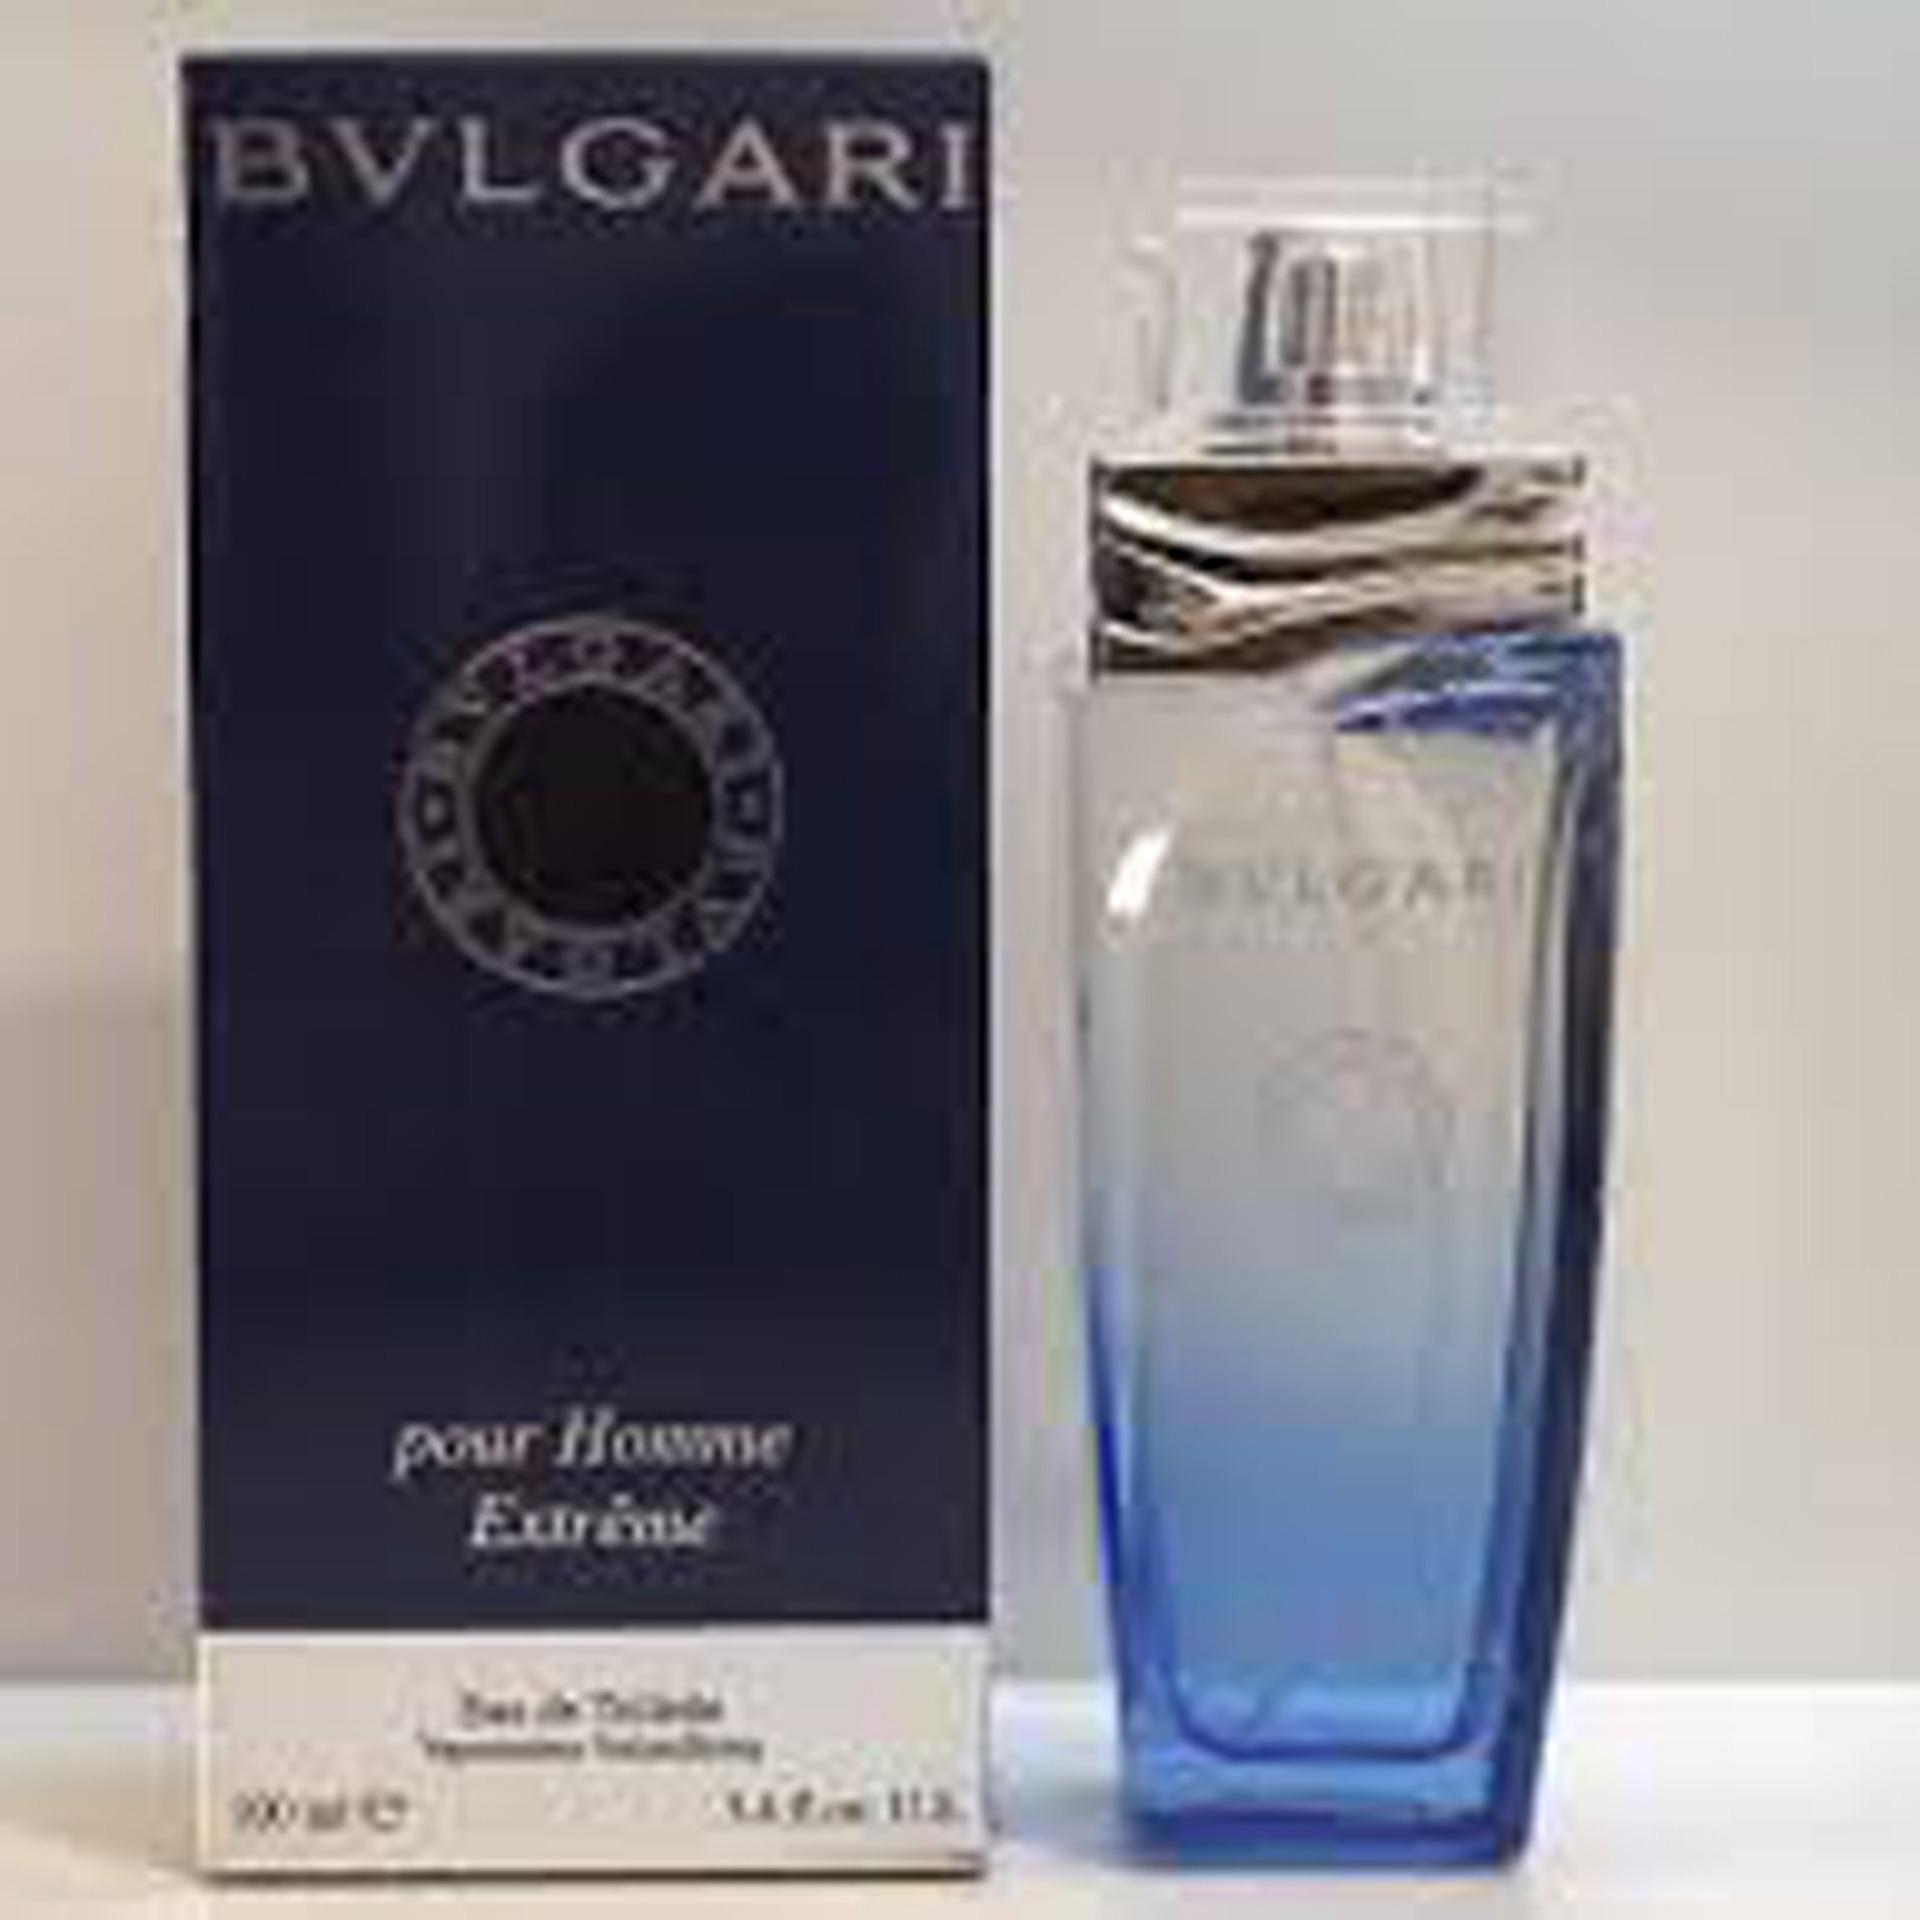 Harga Parfum Terbaru Pria Blg 55 Pour Homme Extreme For Men Yg Bagus